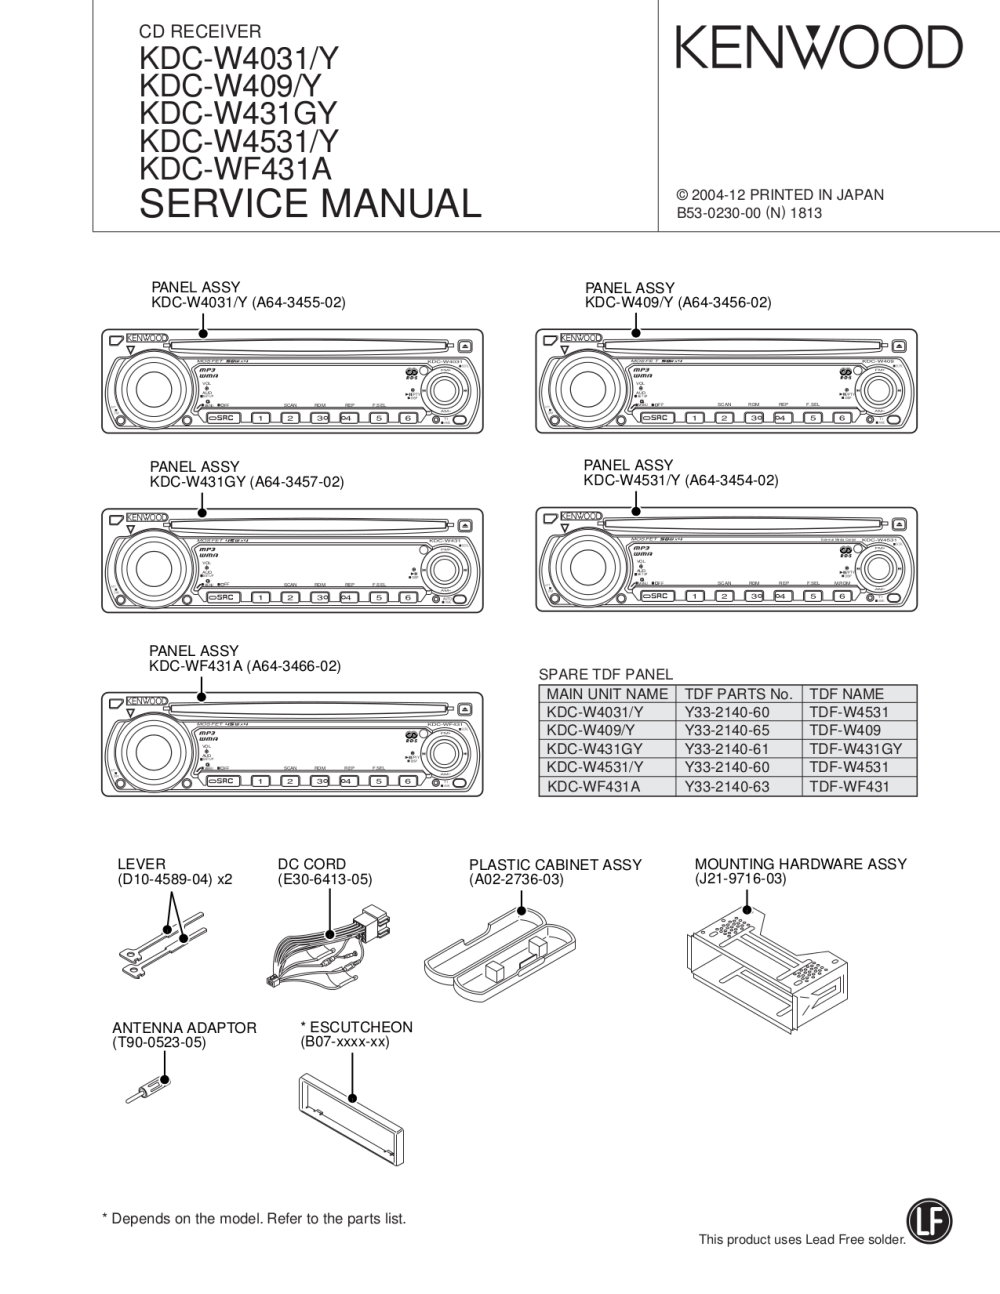 medium resolution of  kdc w4031 w409 w431gy w4531 wf431a pdf 0 download free pdf for kenwood kdc 319 car receiver manual kenwood